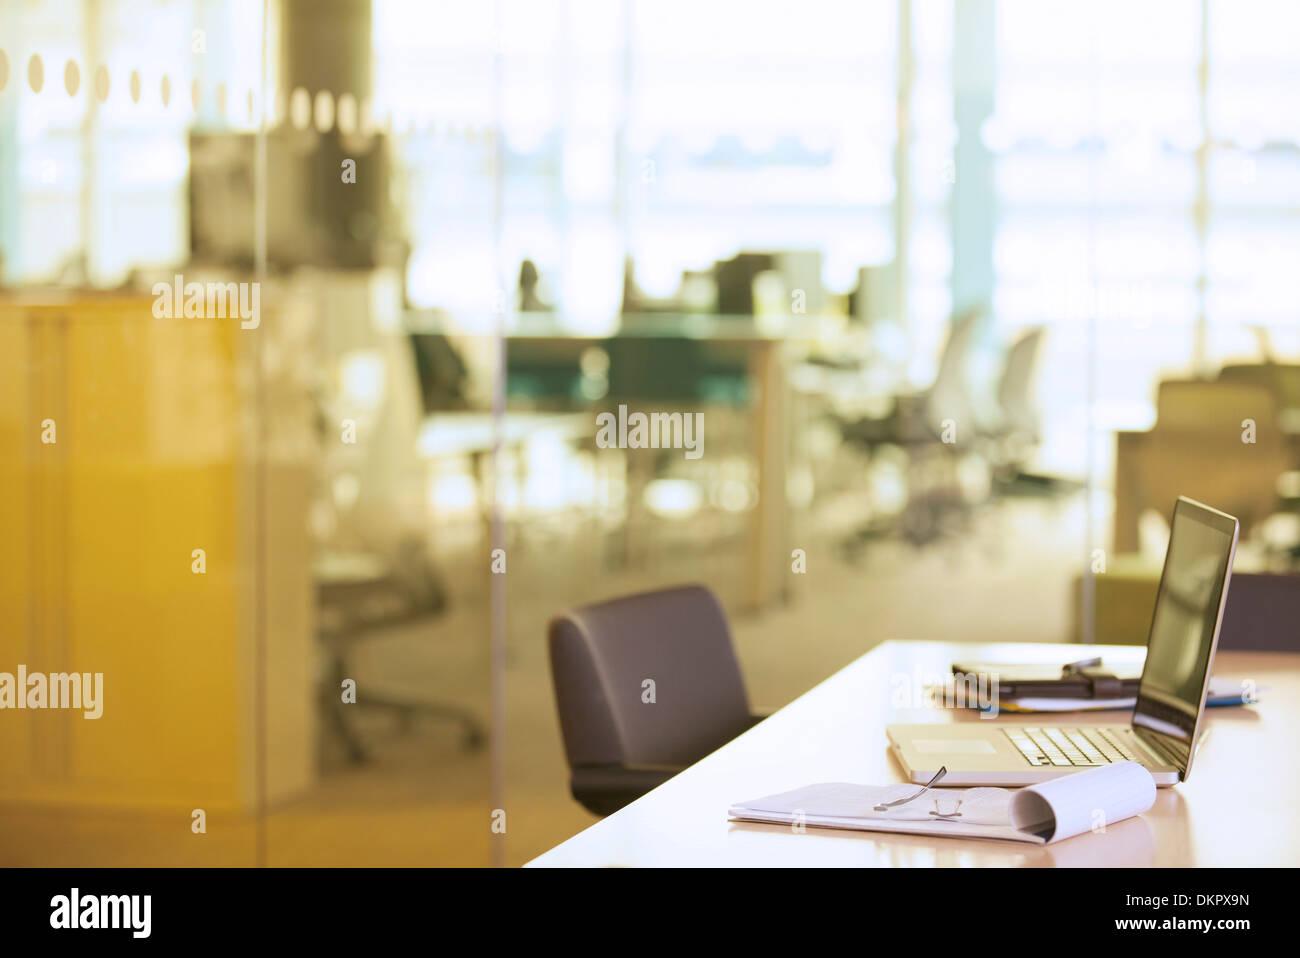 Laptop on desk in office - Stock Image